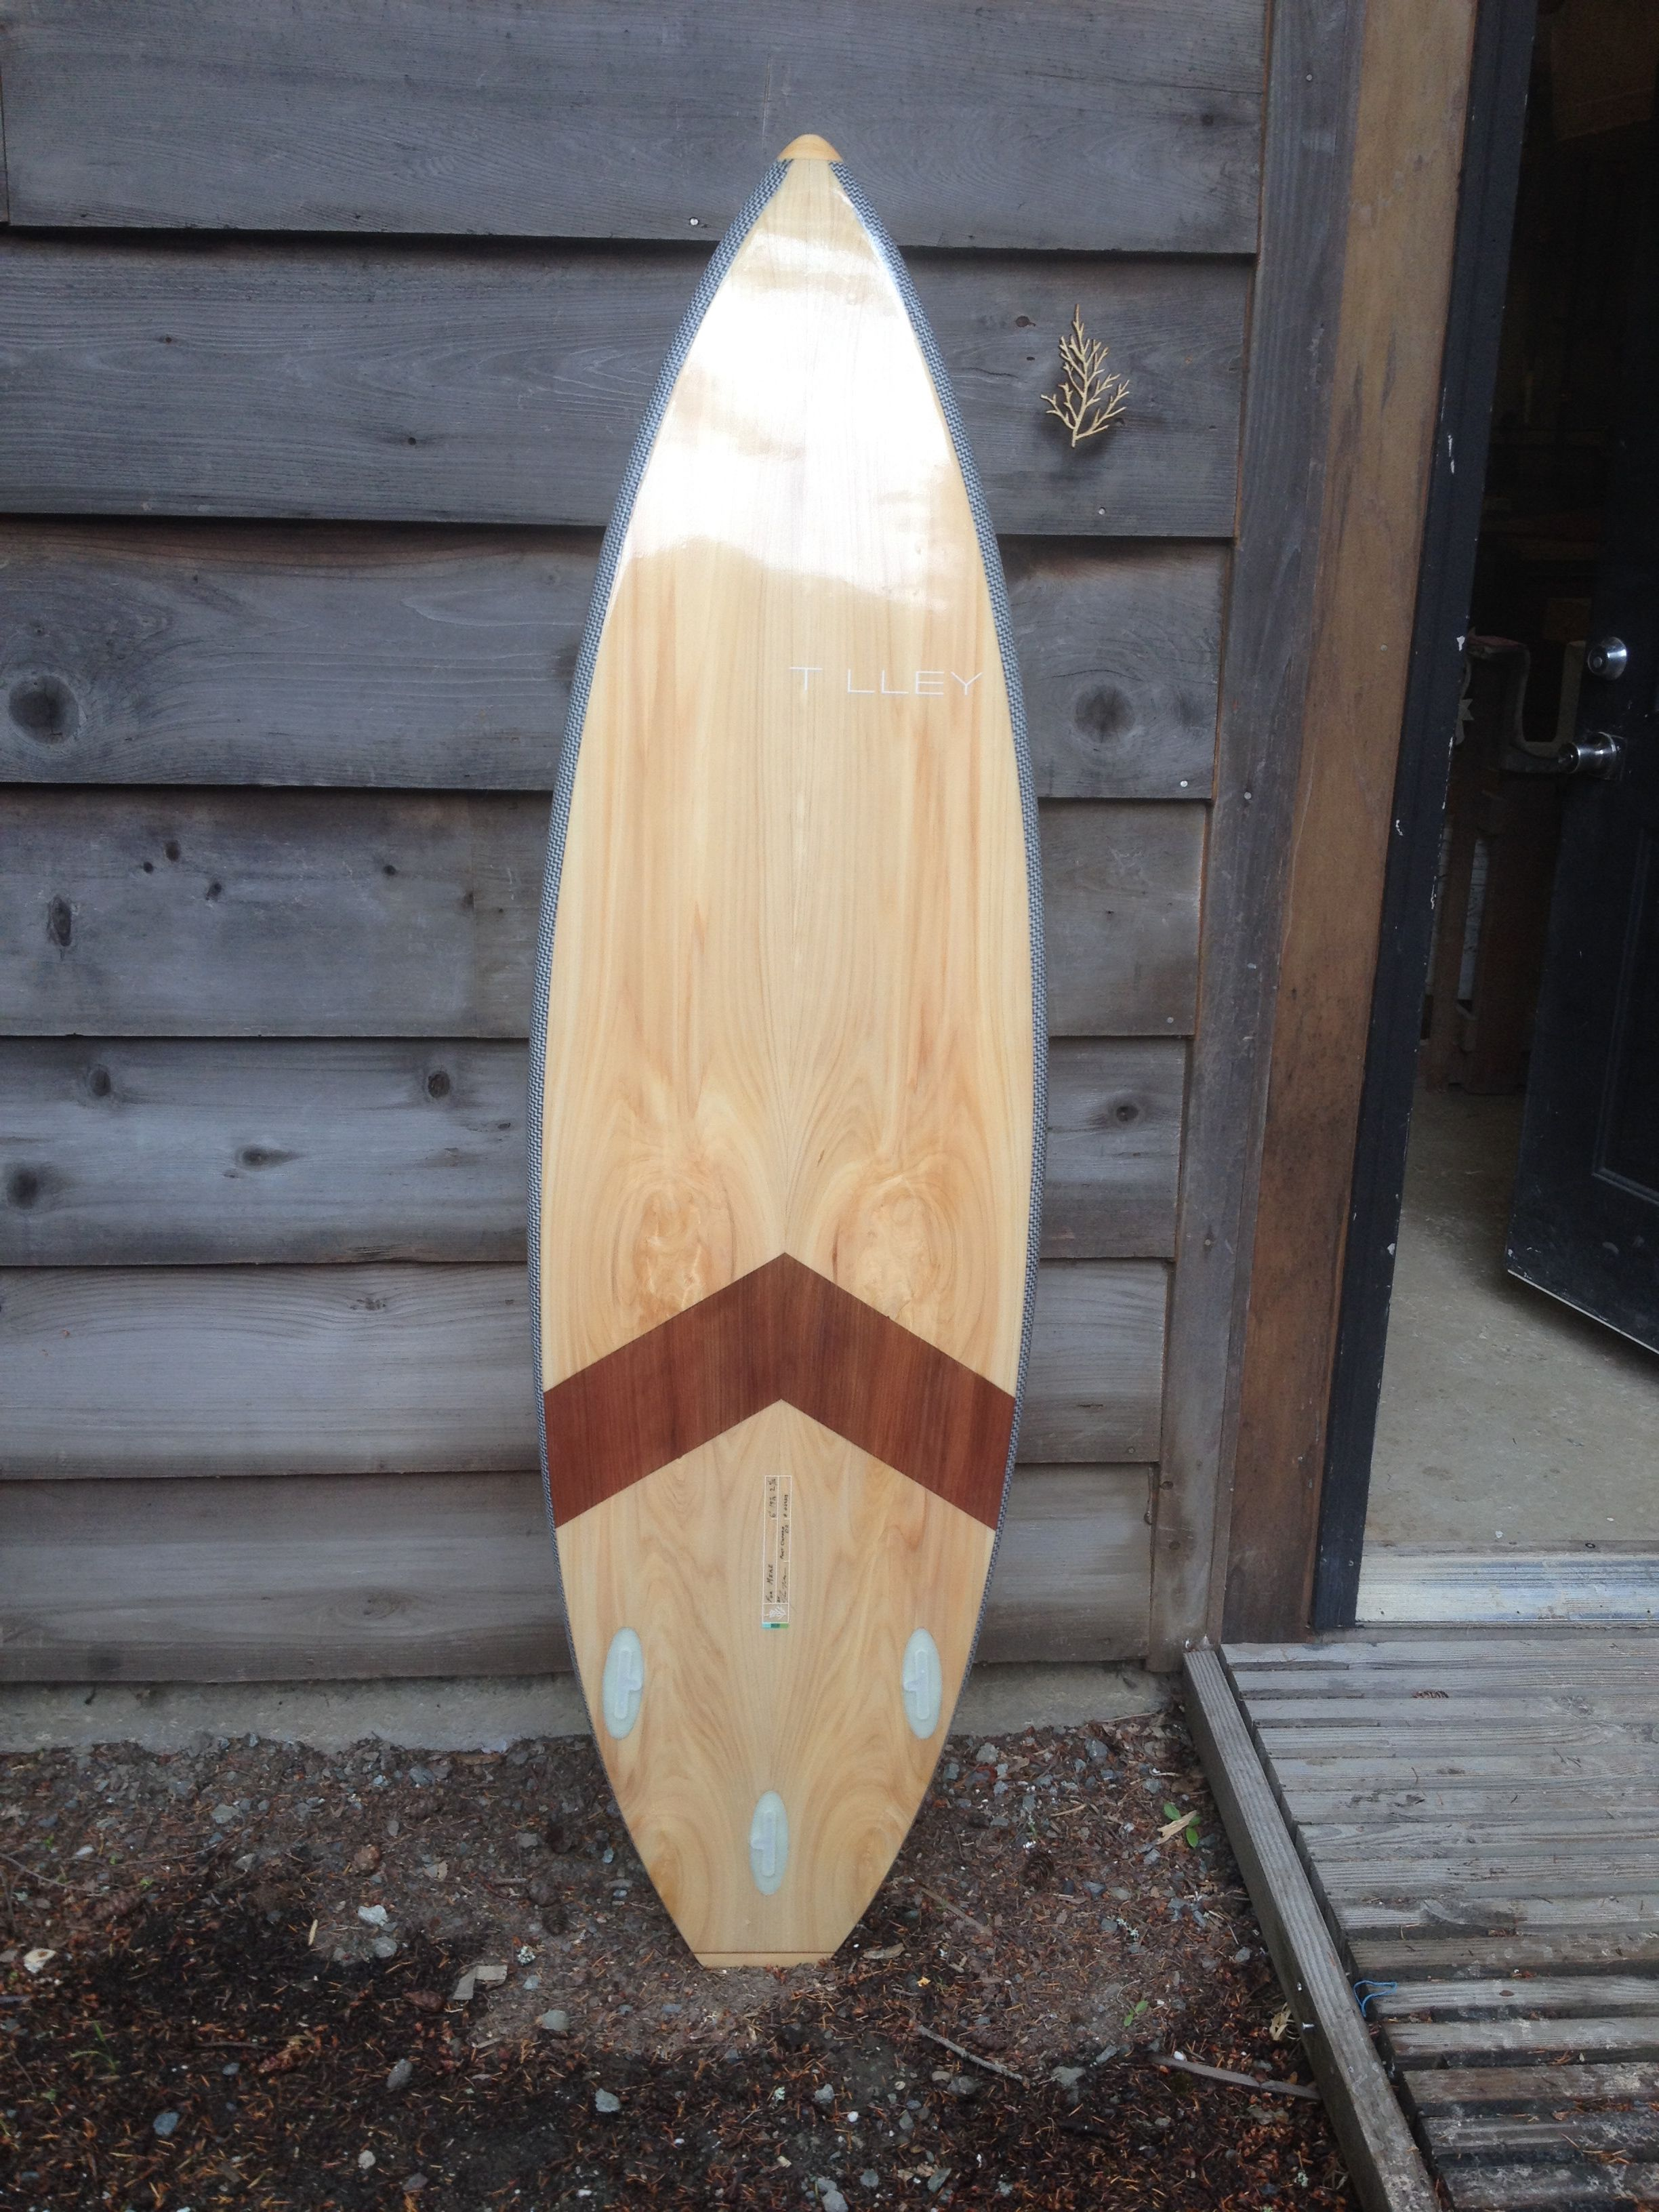 6' x 19 1/2 x 2 3/8 Kiteboard/surfboard in Port orford cedar, redwood, carbon/innegra